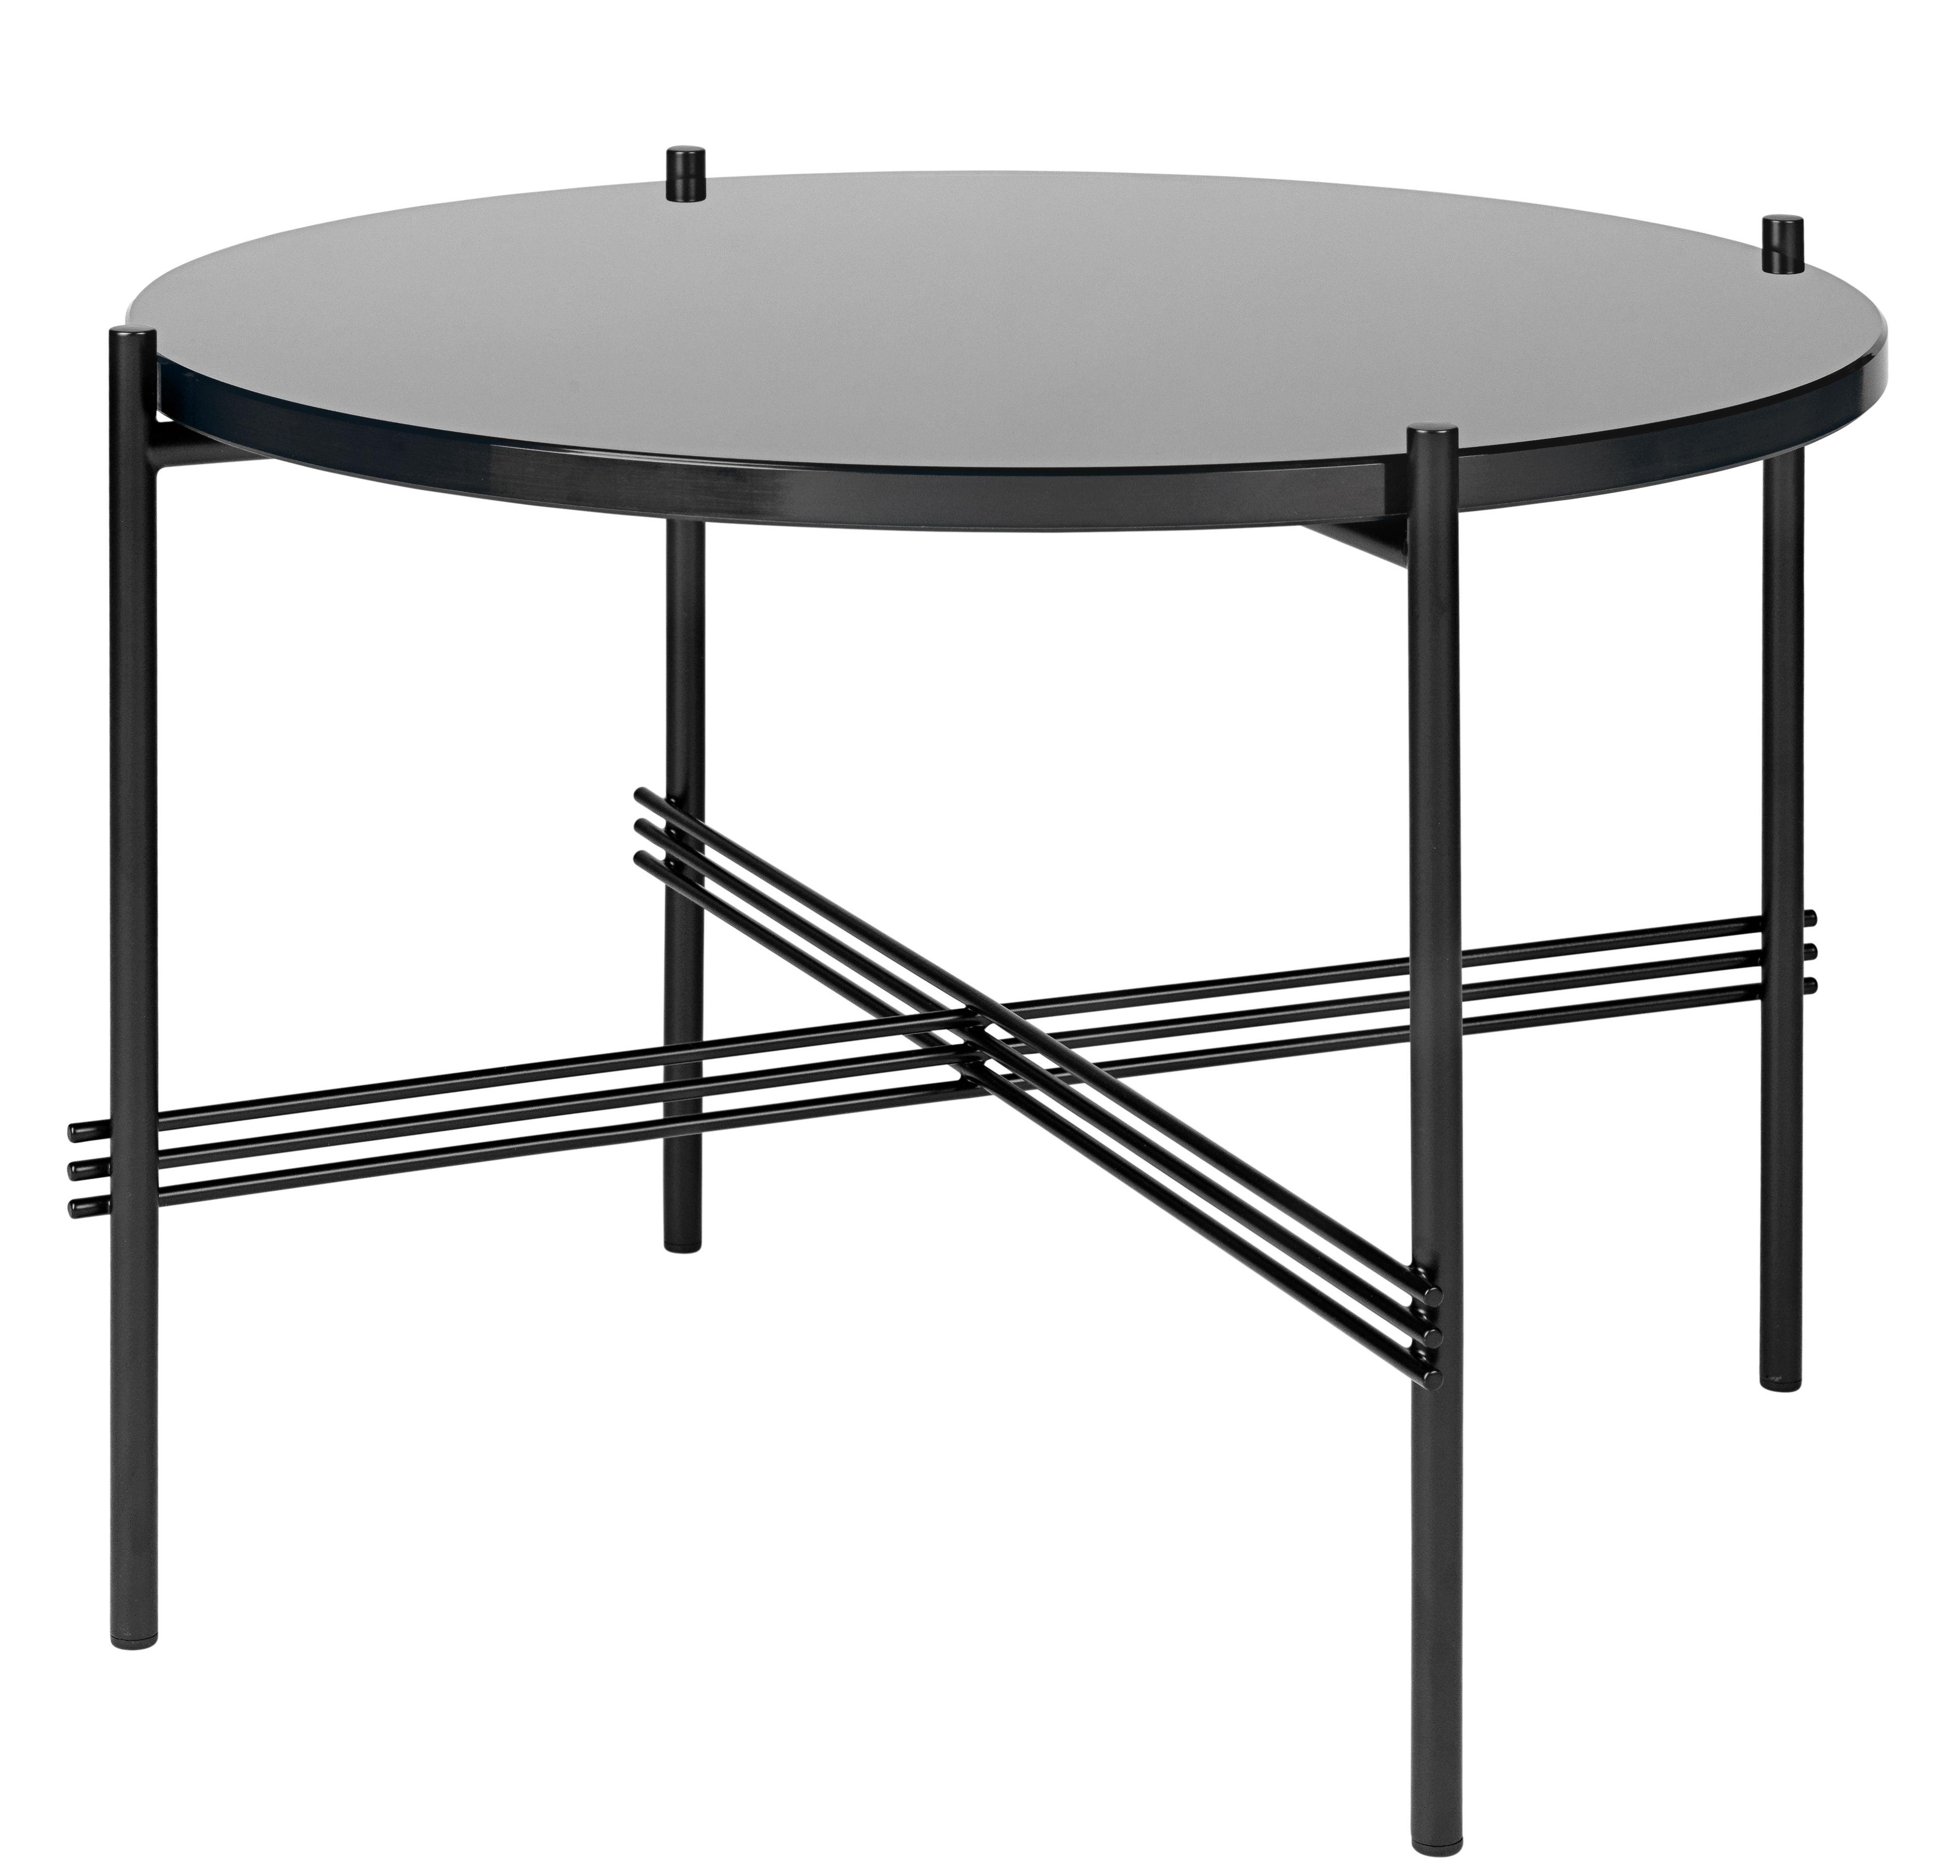 table basse ts gamfratesi 55 cm x h 41 cm verre verre noir pied noir gubi. Black Bedroom Furniture Sets. Home Design Ideas